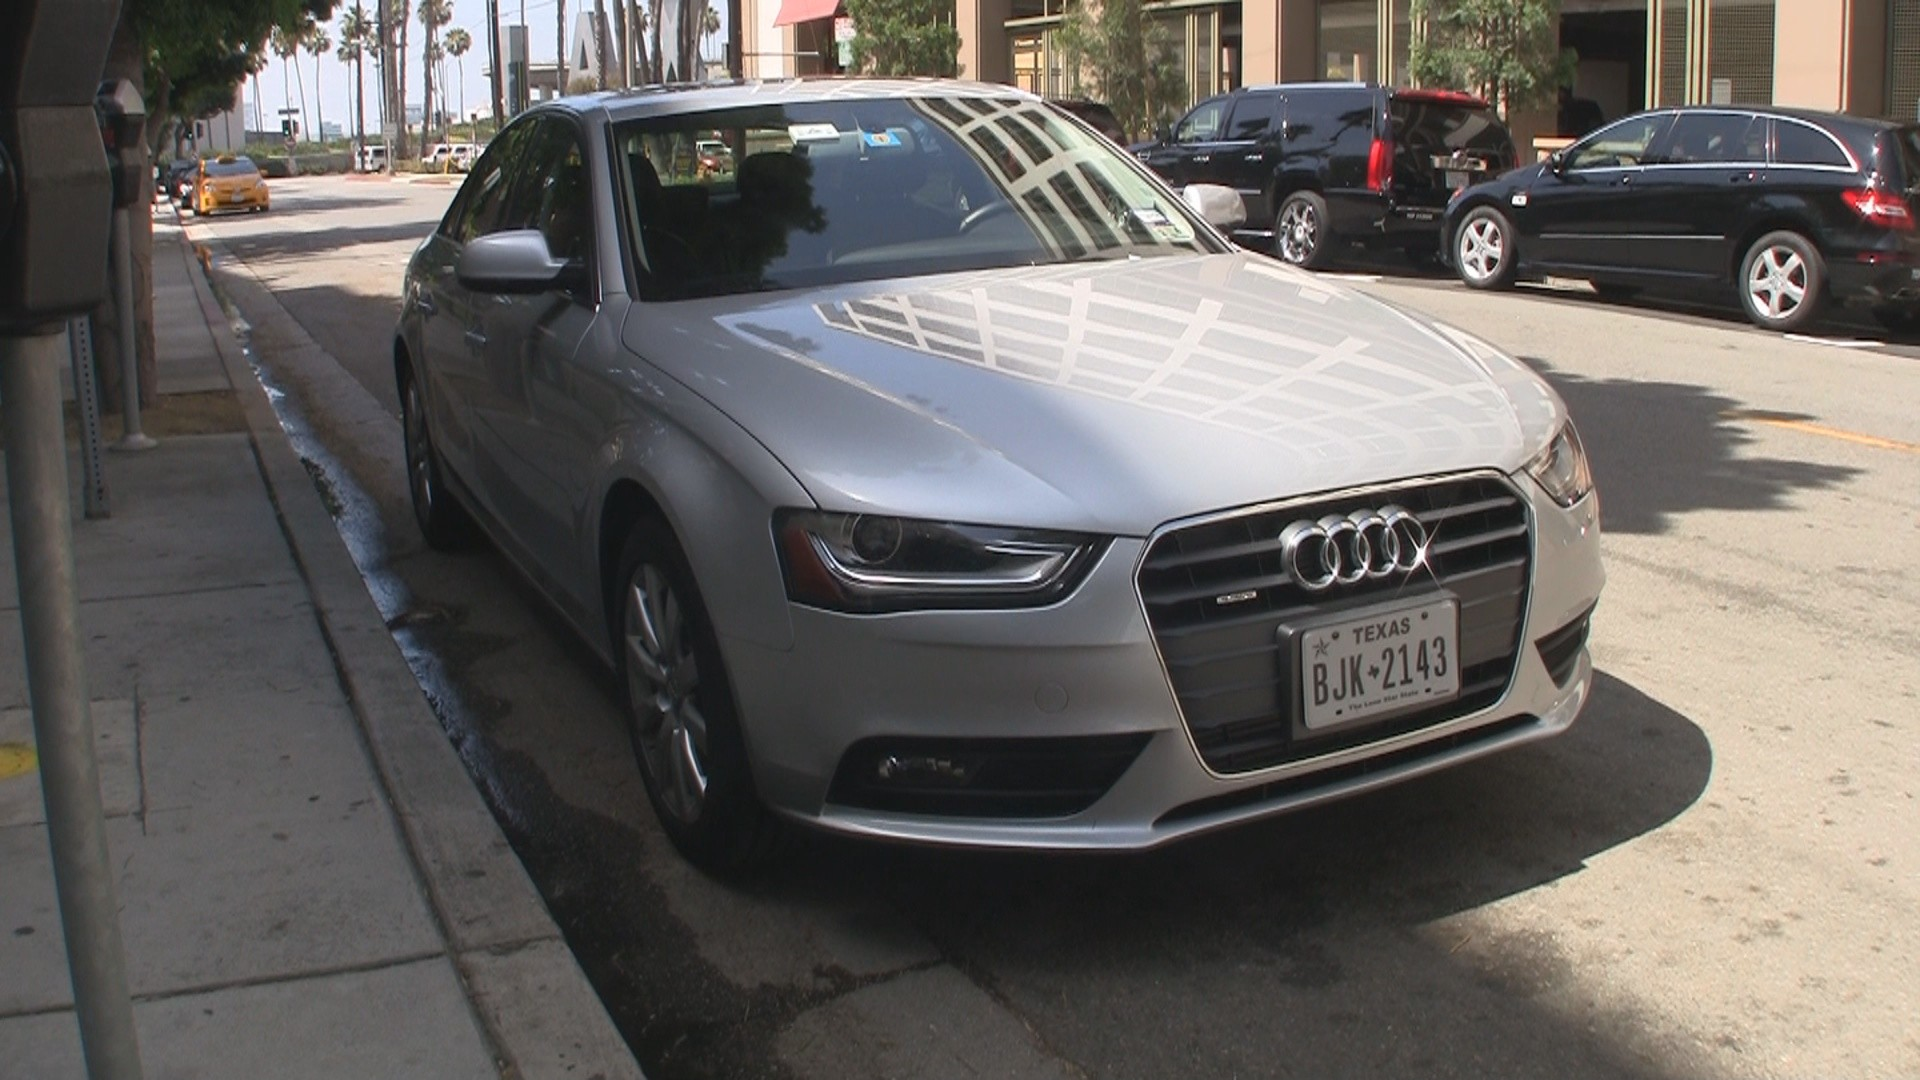 Silvercar Audi A4 at LAX